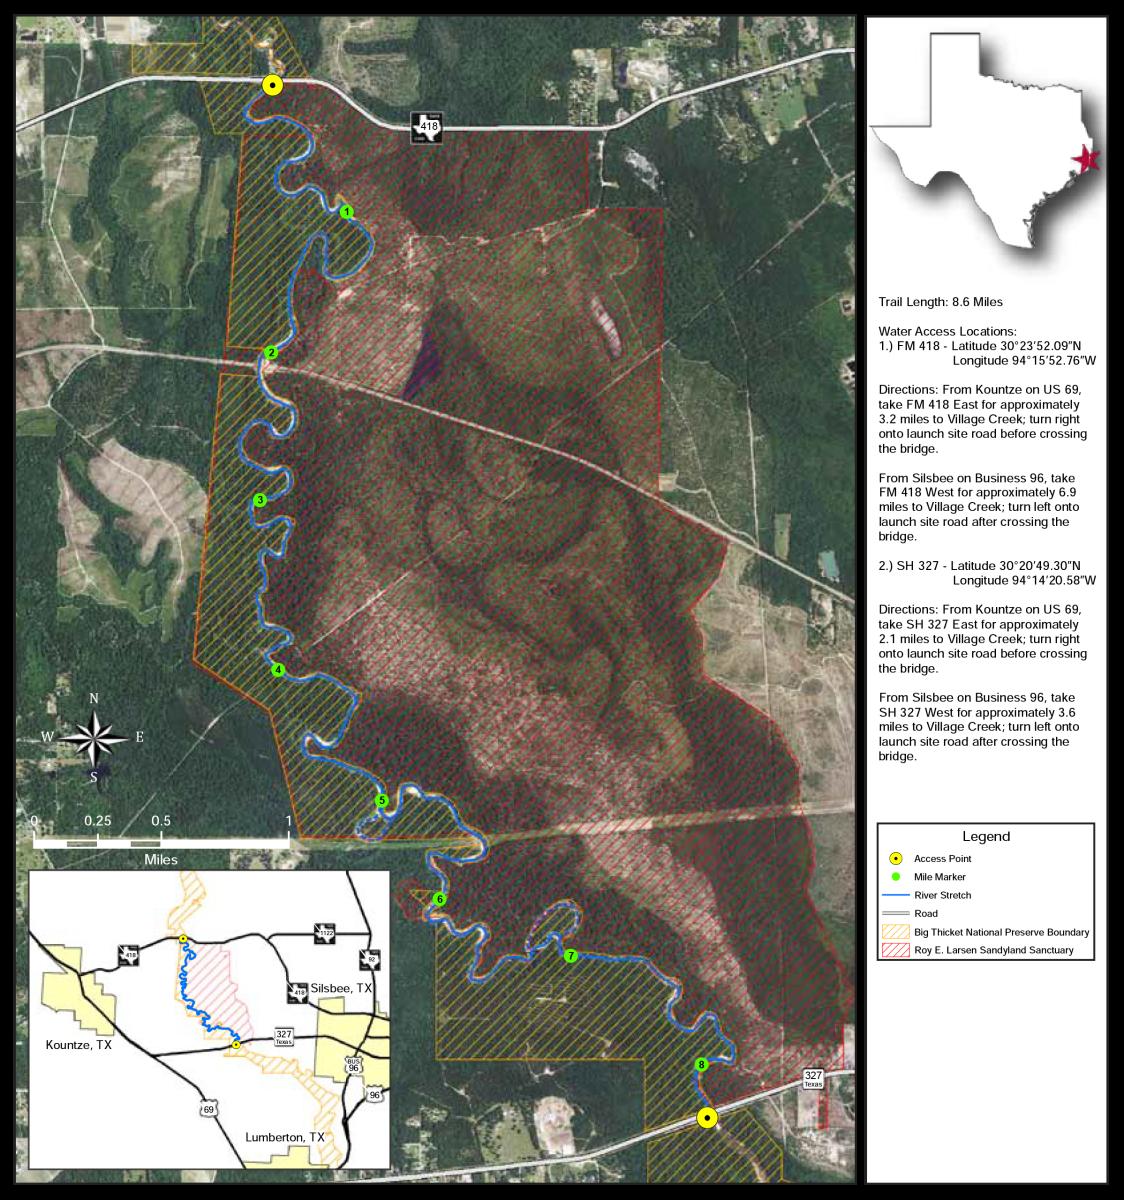 Village Creek Paddle Map